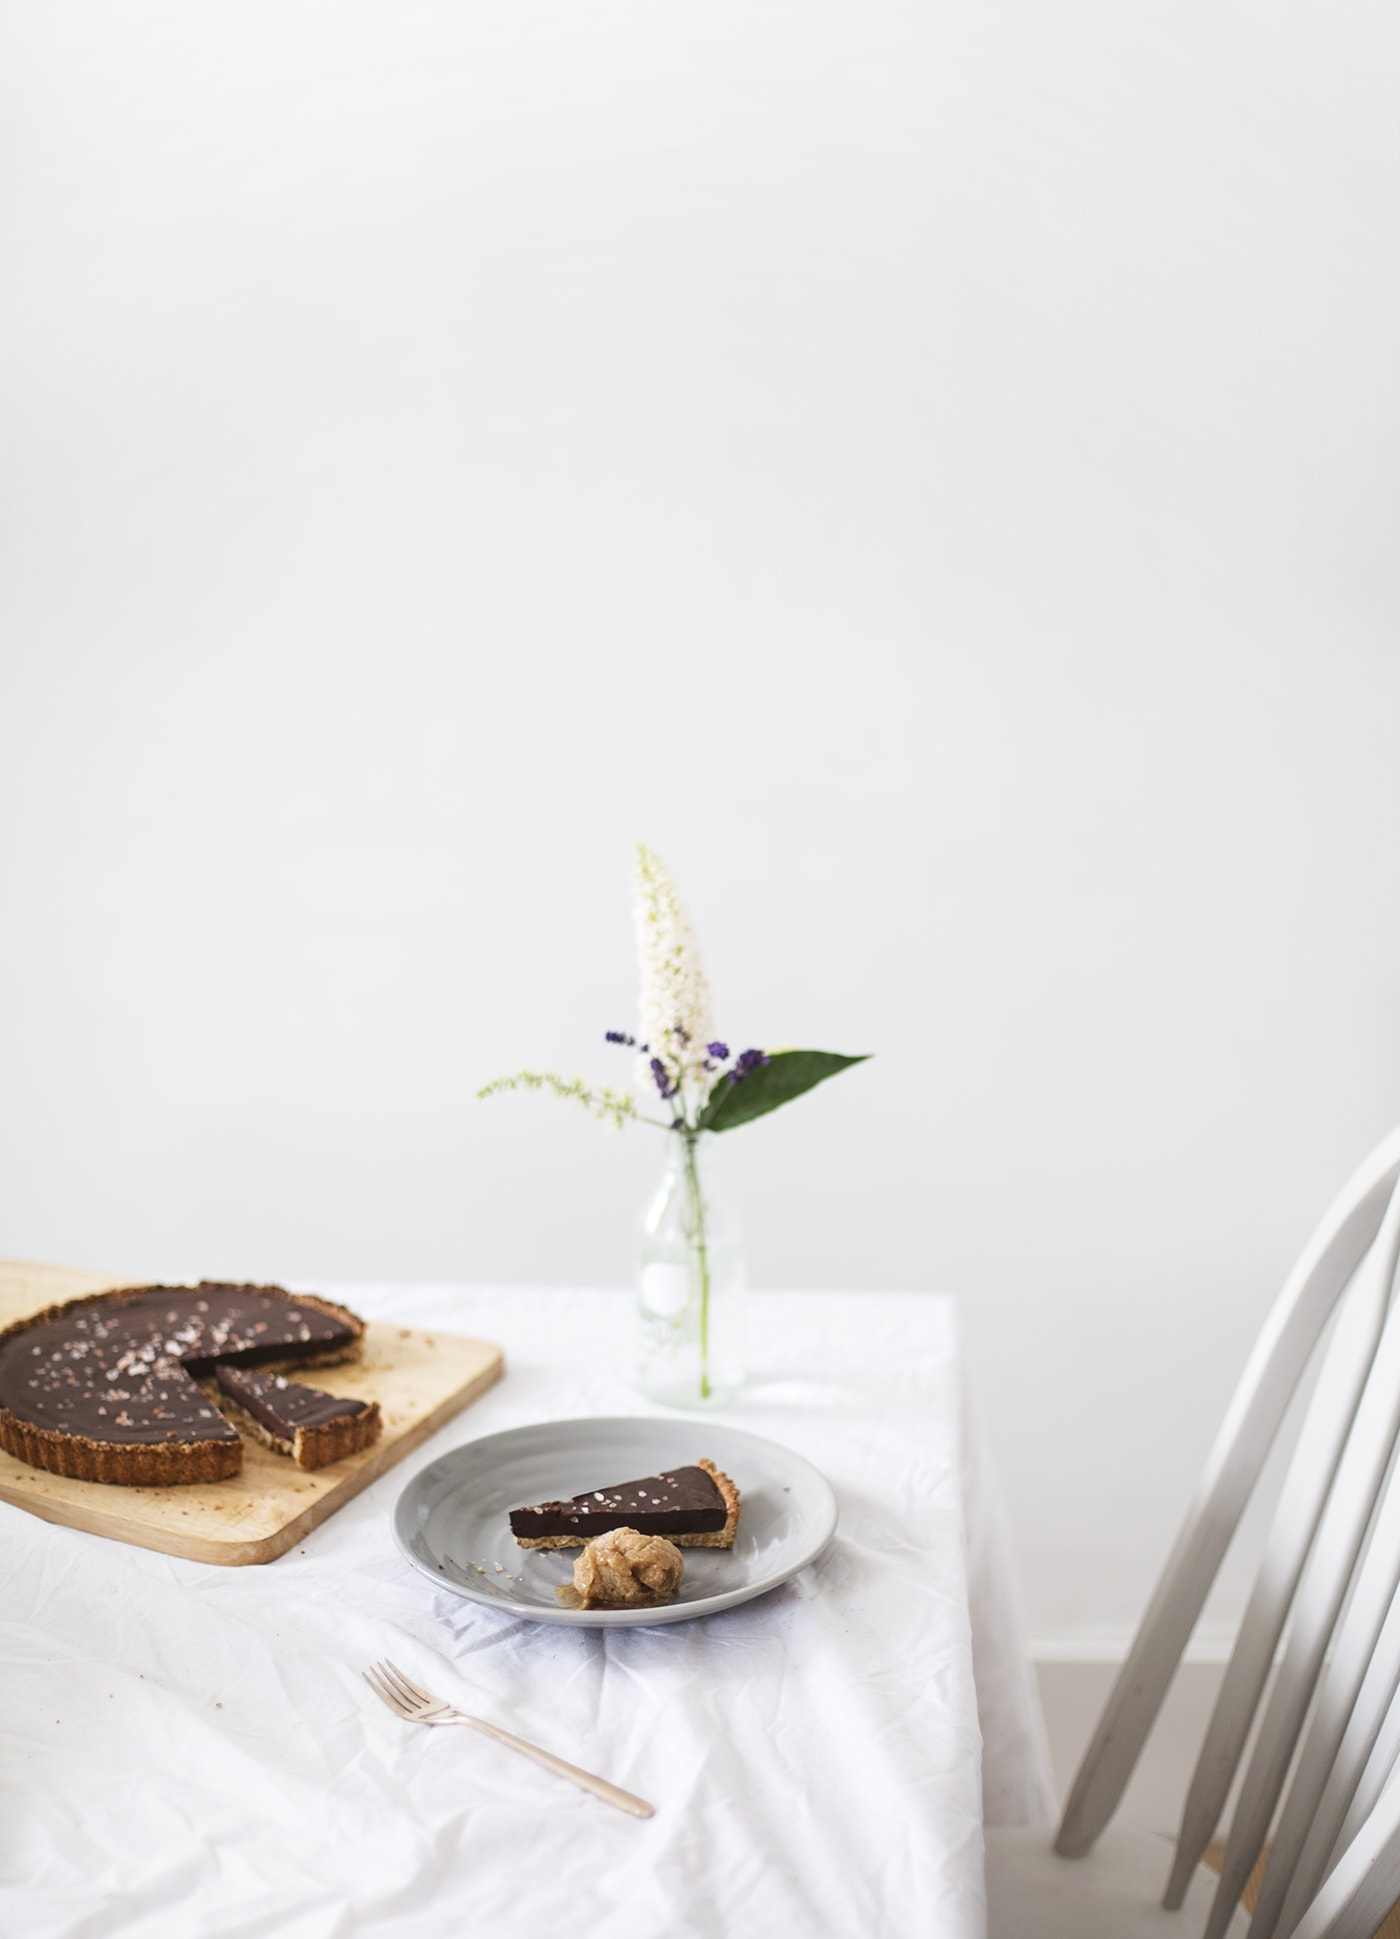 GF vegan healthy chocolate tart